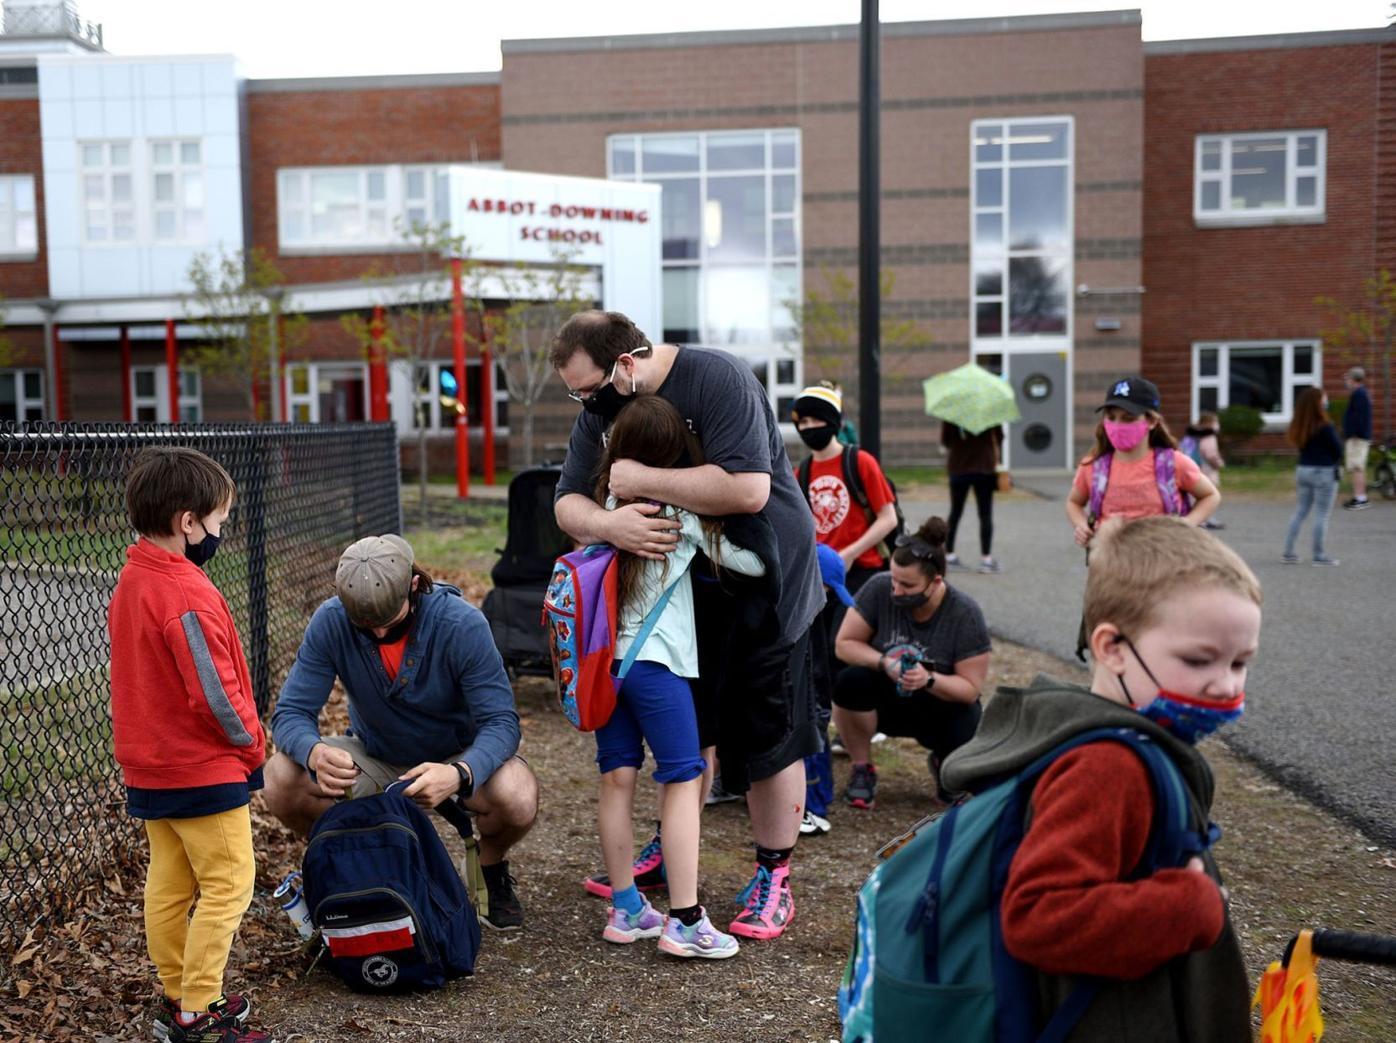 Hugs at Abbot-Downing School